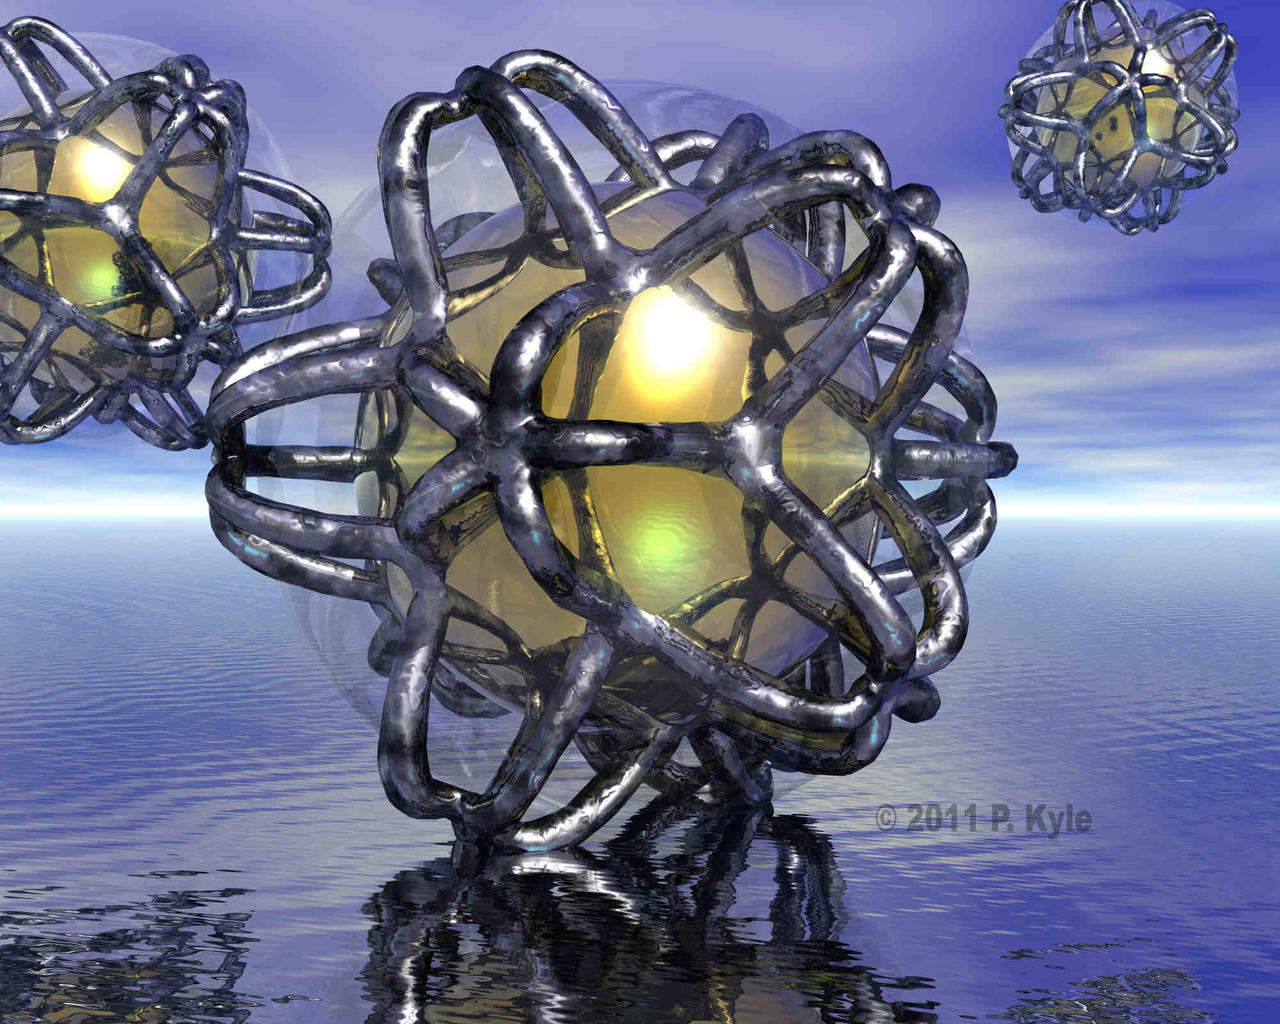 Buckeybots by fractalyst